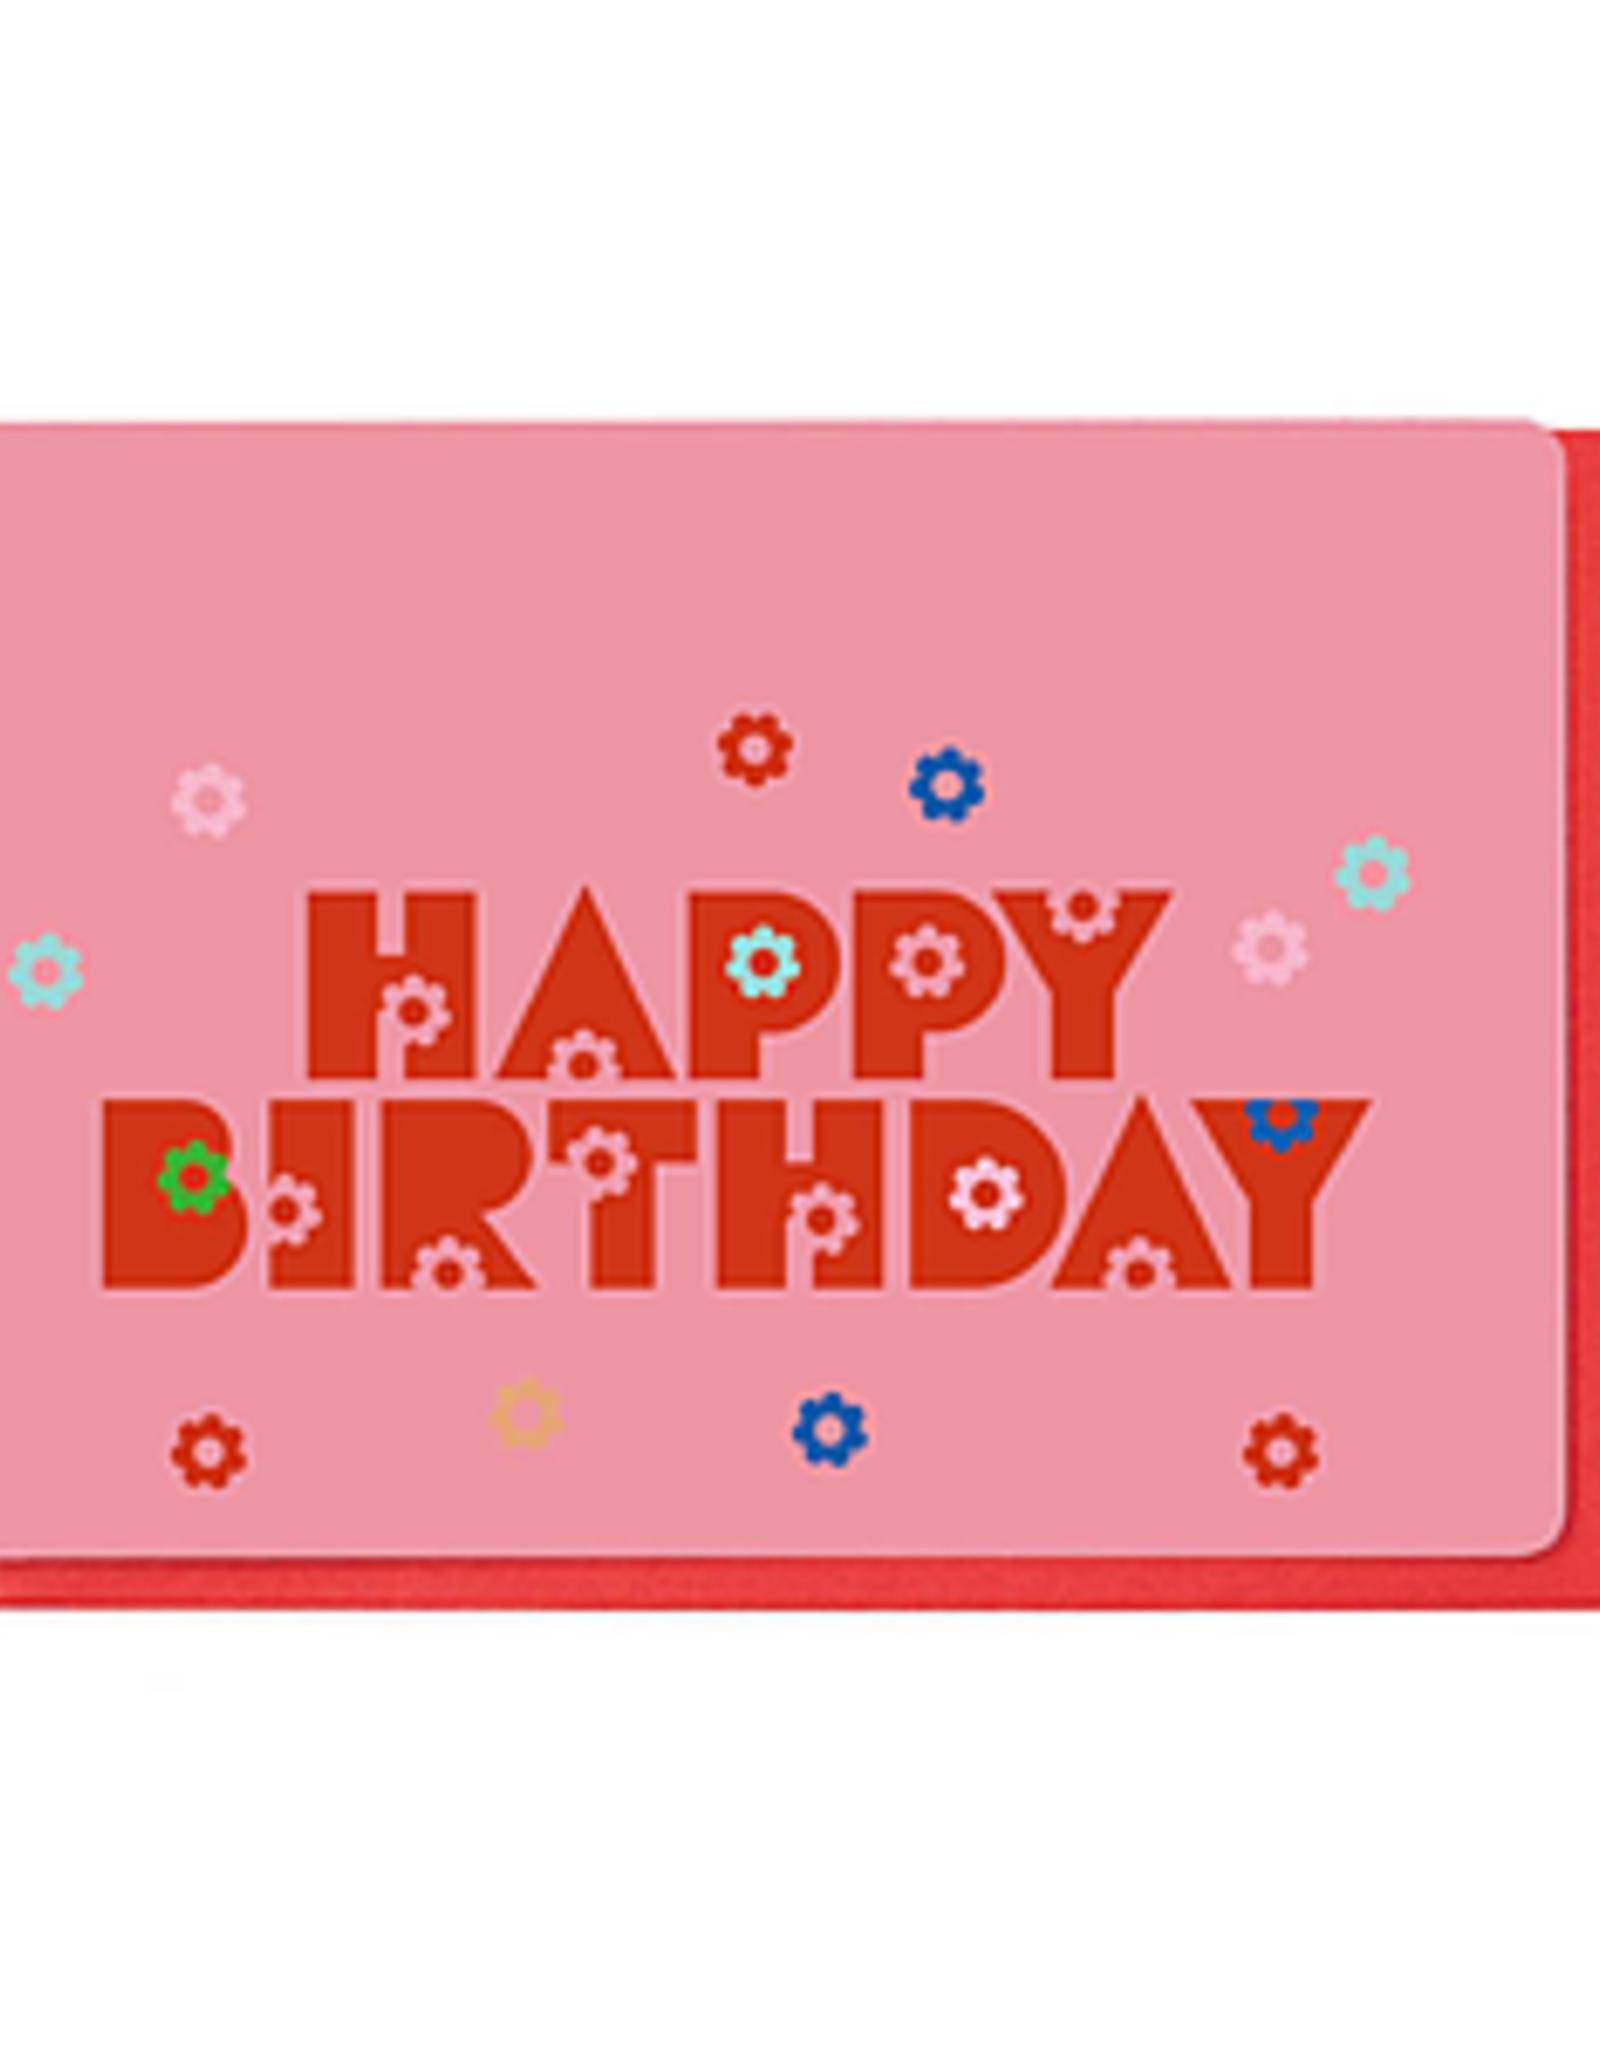 Enfant Terrible Dubbele wenskaart Enfant terrible: happy birthday bloemetjes